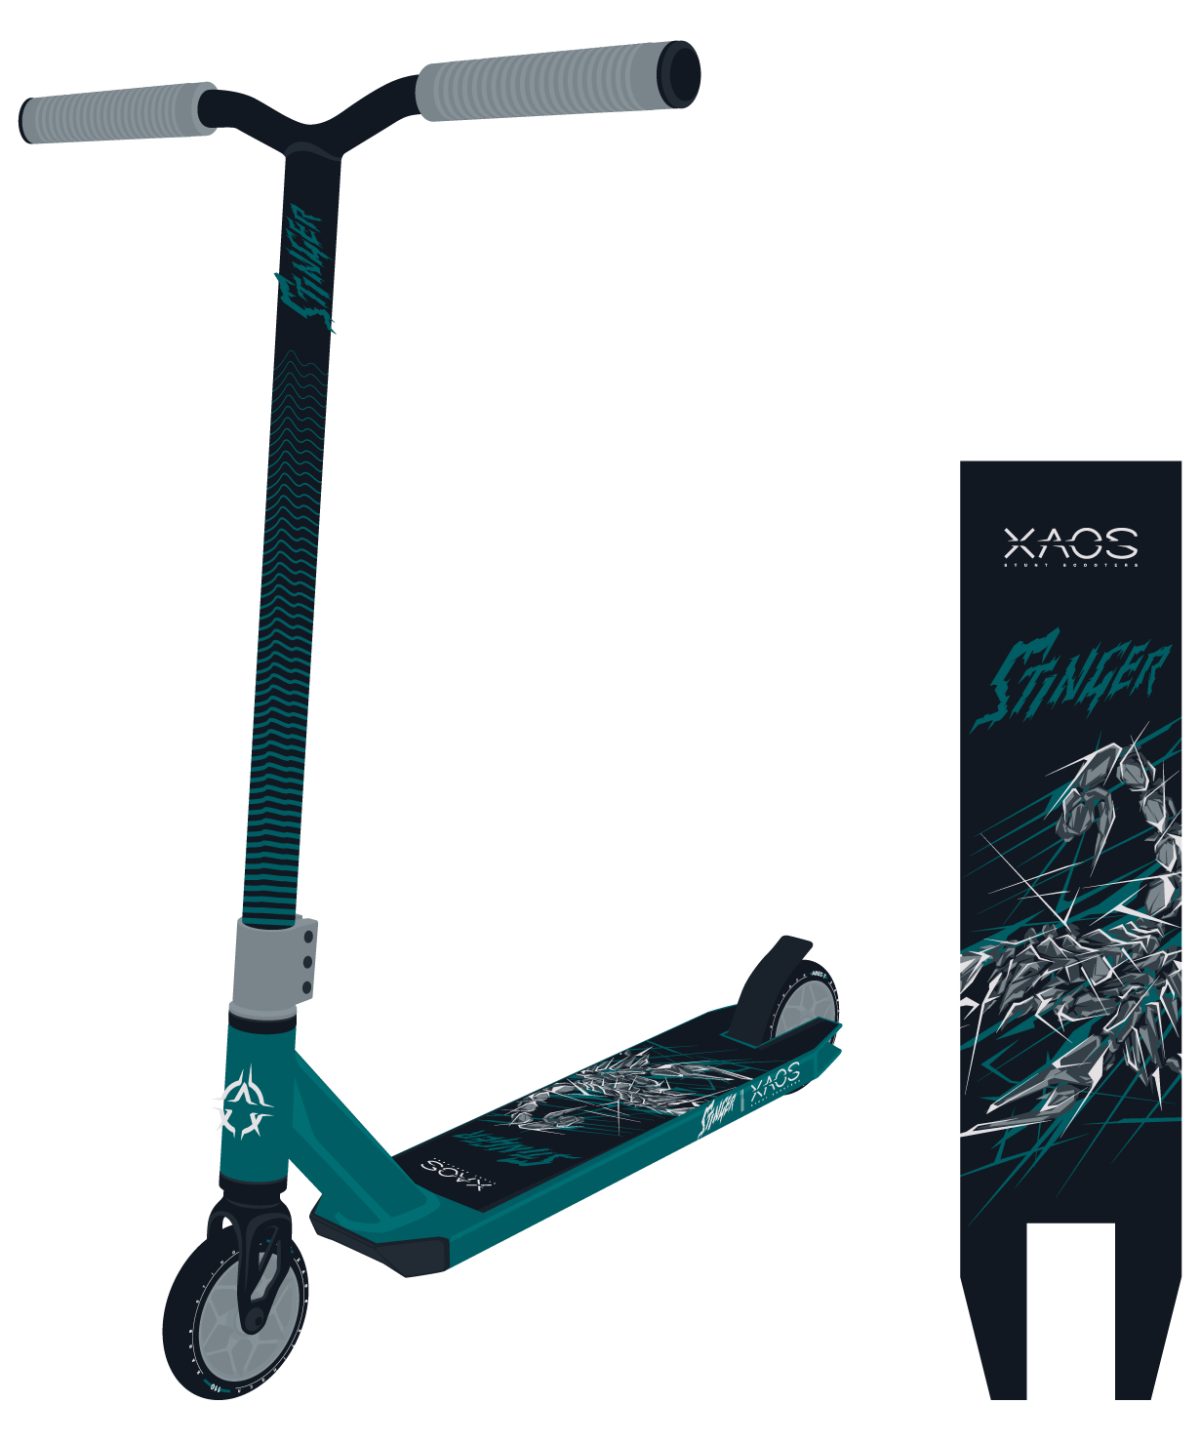 XAOS Stinger Самокат трюковый 110 мм  Stinger: Green - 1